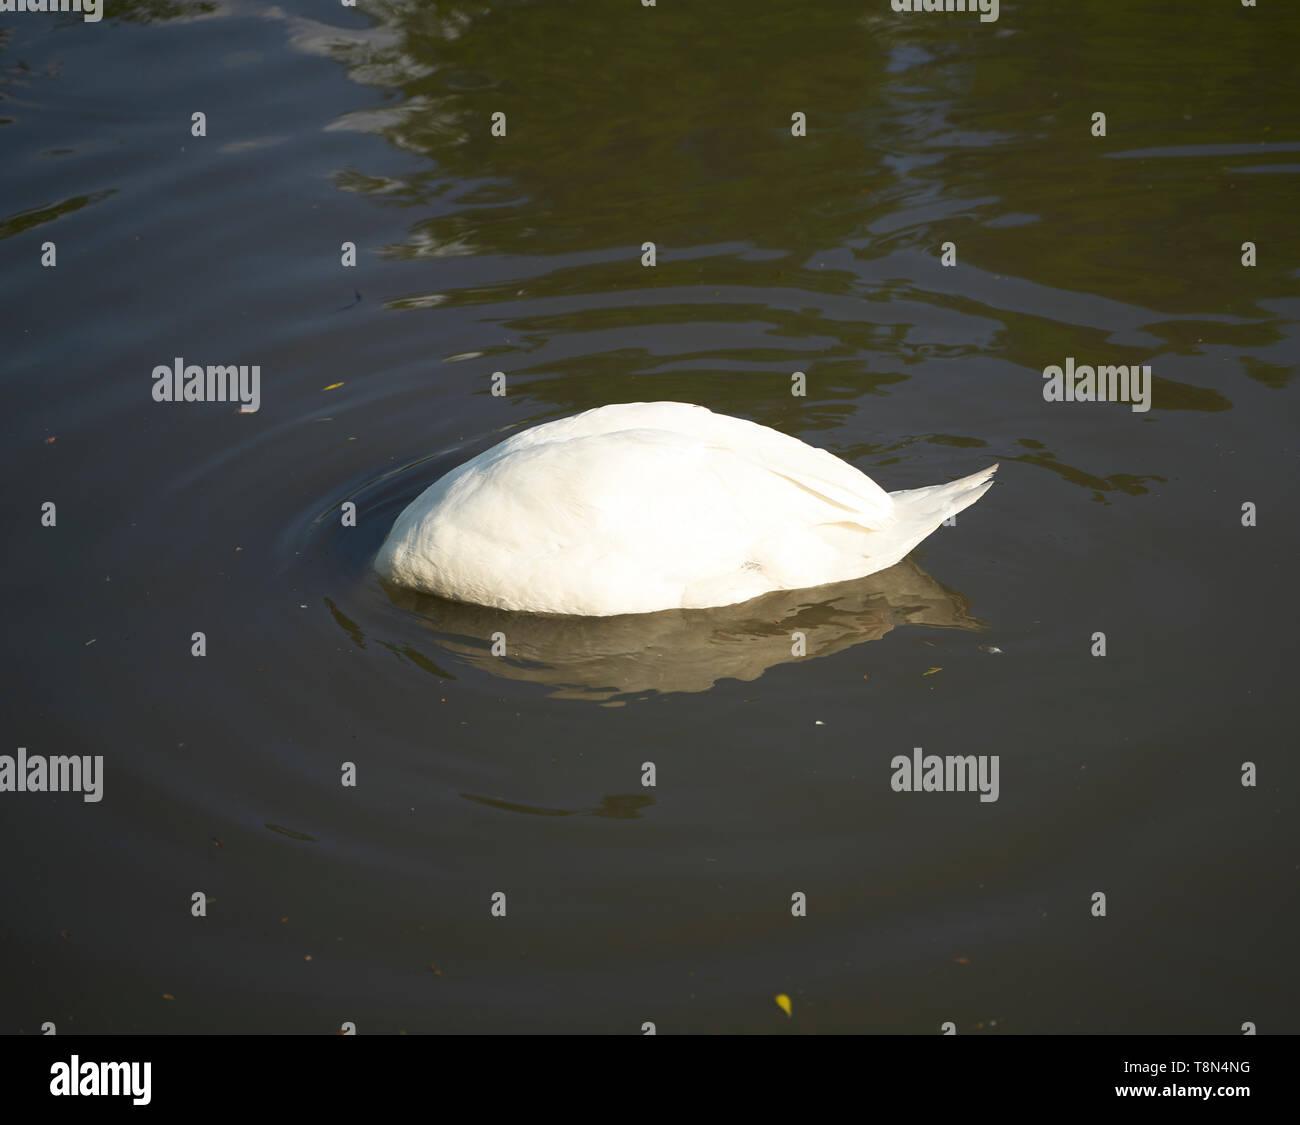 Swan with head underwater - Stock Image